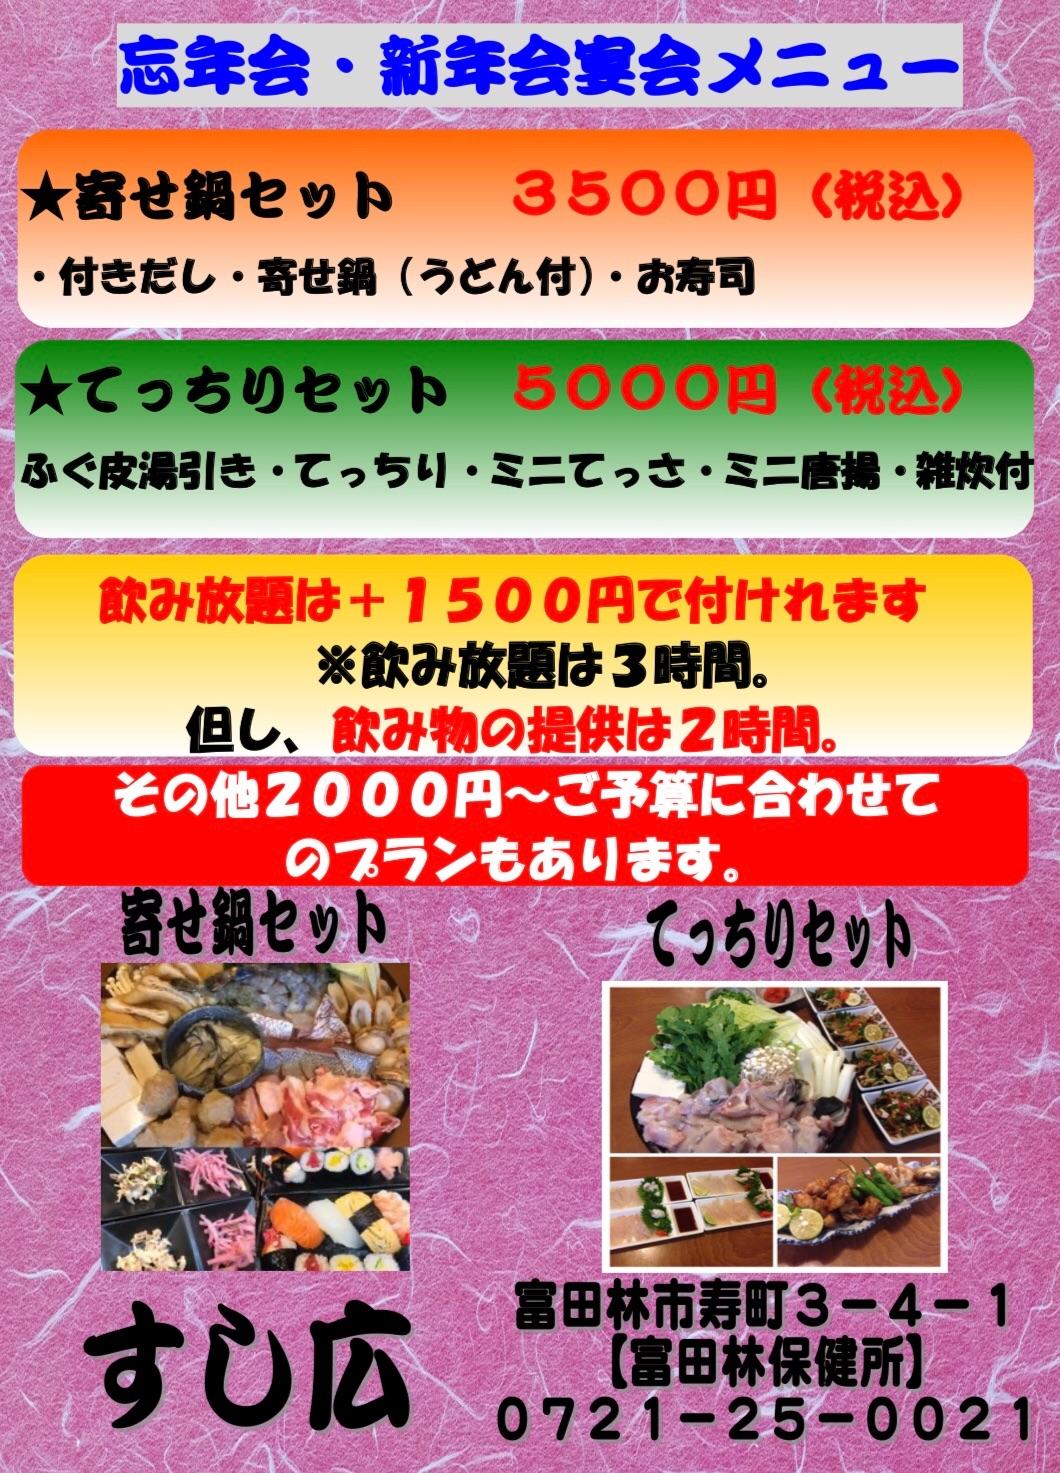 f:id:carp_0301_kenta:20191120080756j:image